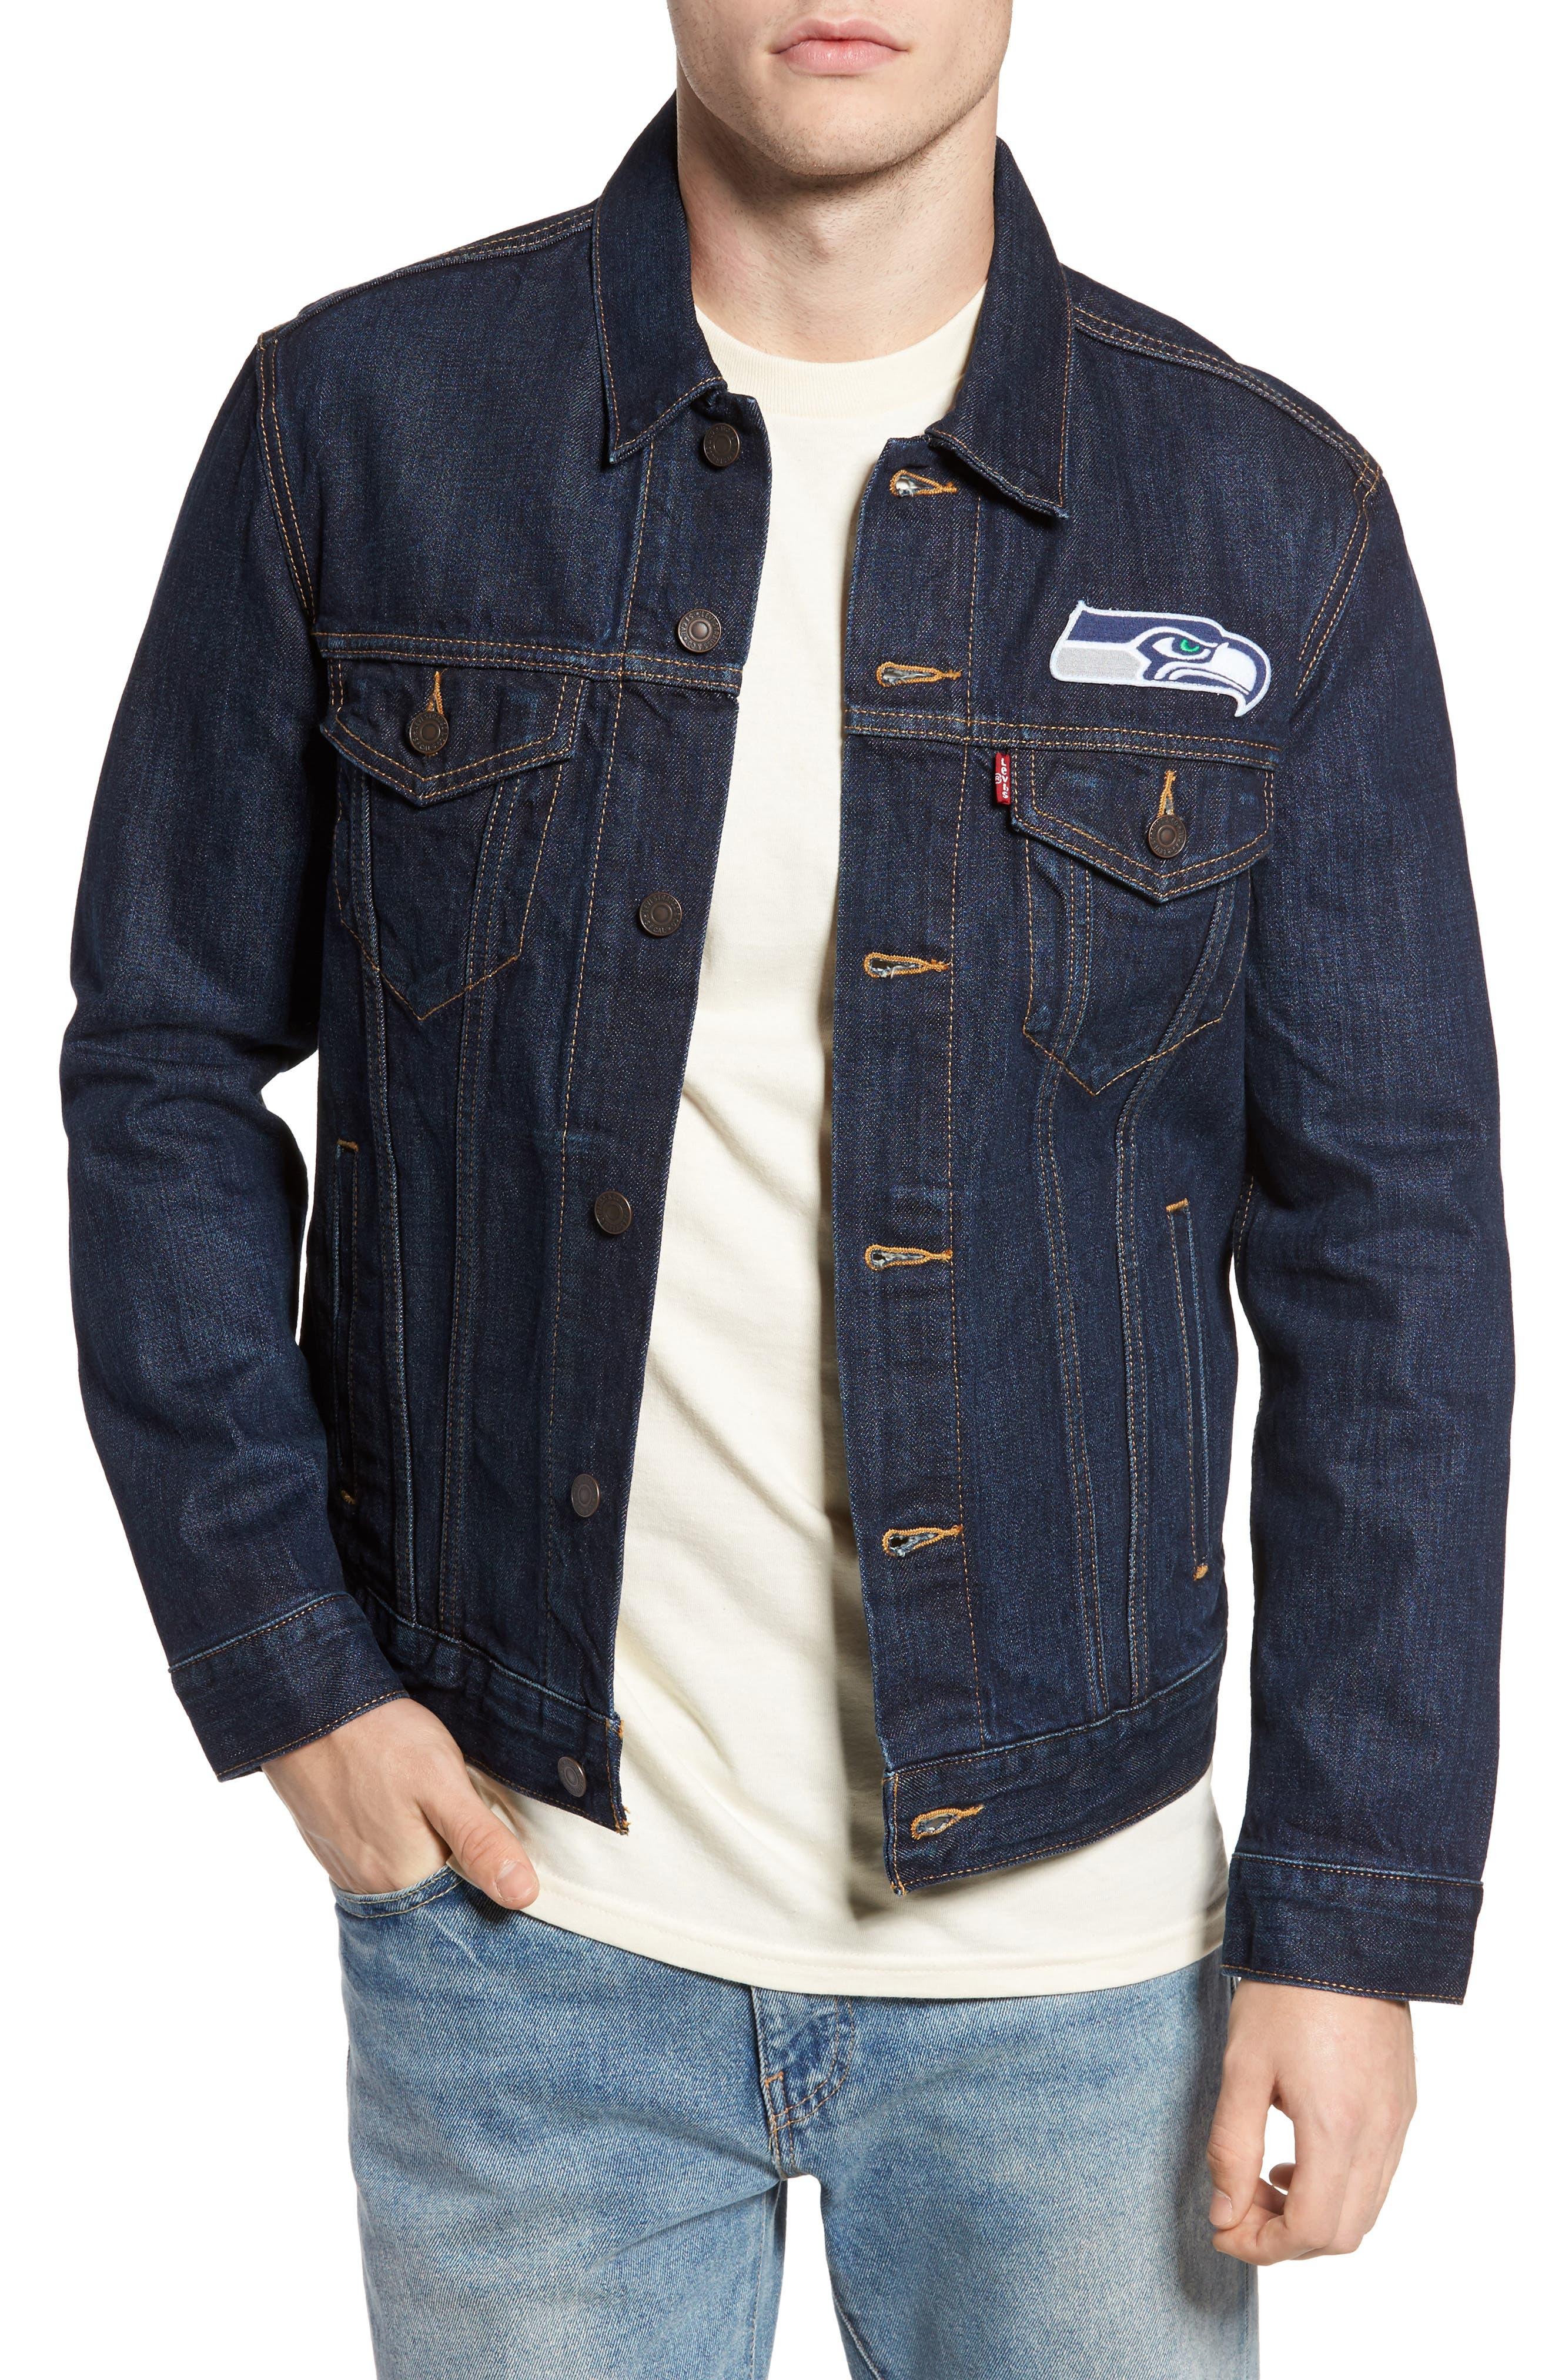 Main Image - Levi's® Seattle Seahawks Denim Trucker Jacket